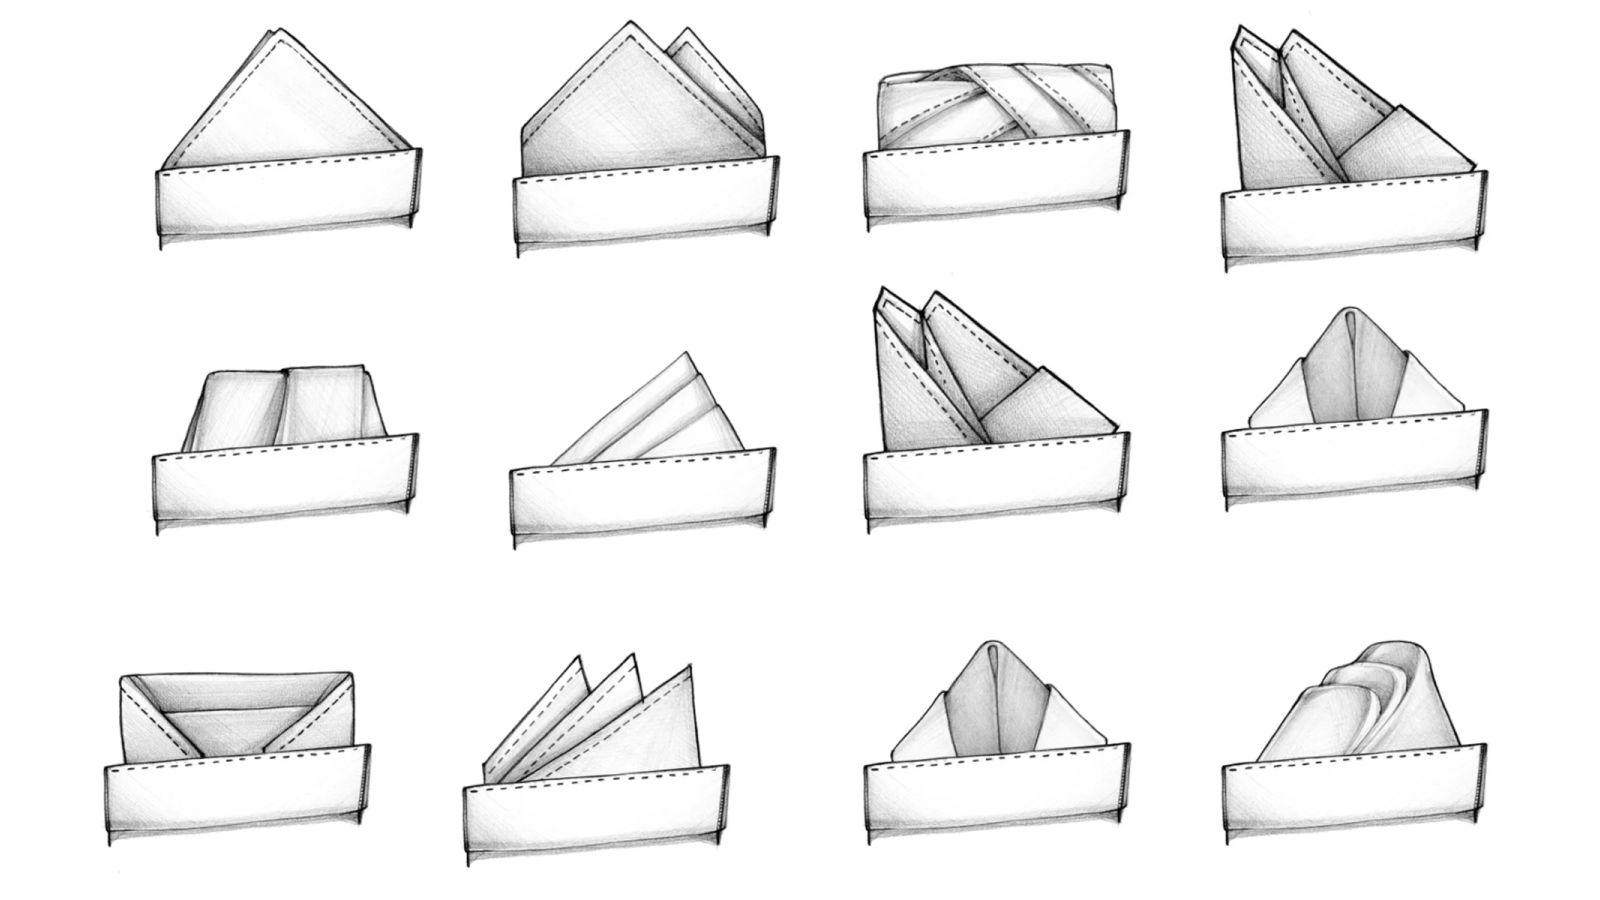 52 Ways to Fold a Pocket Square